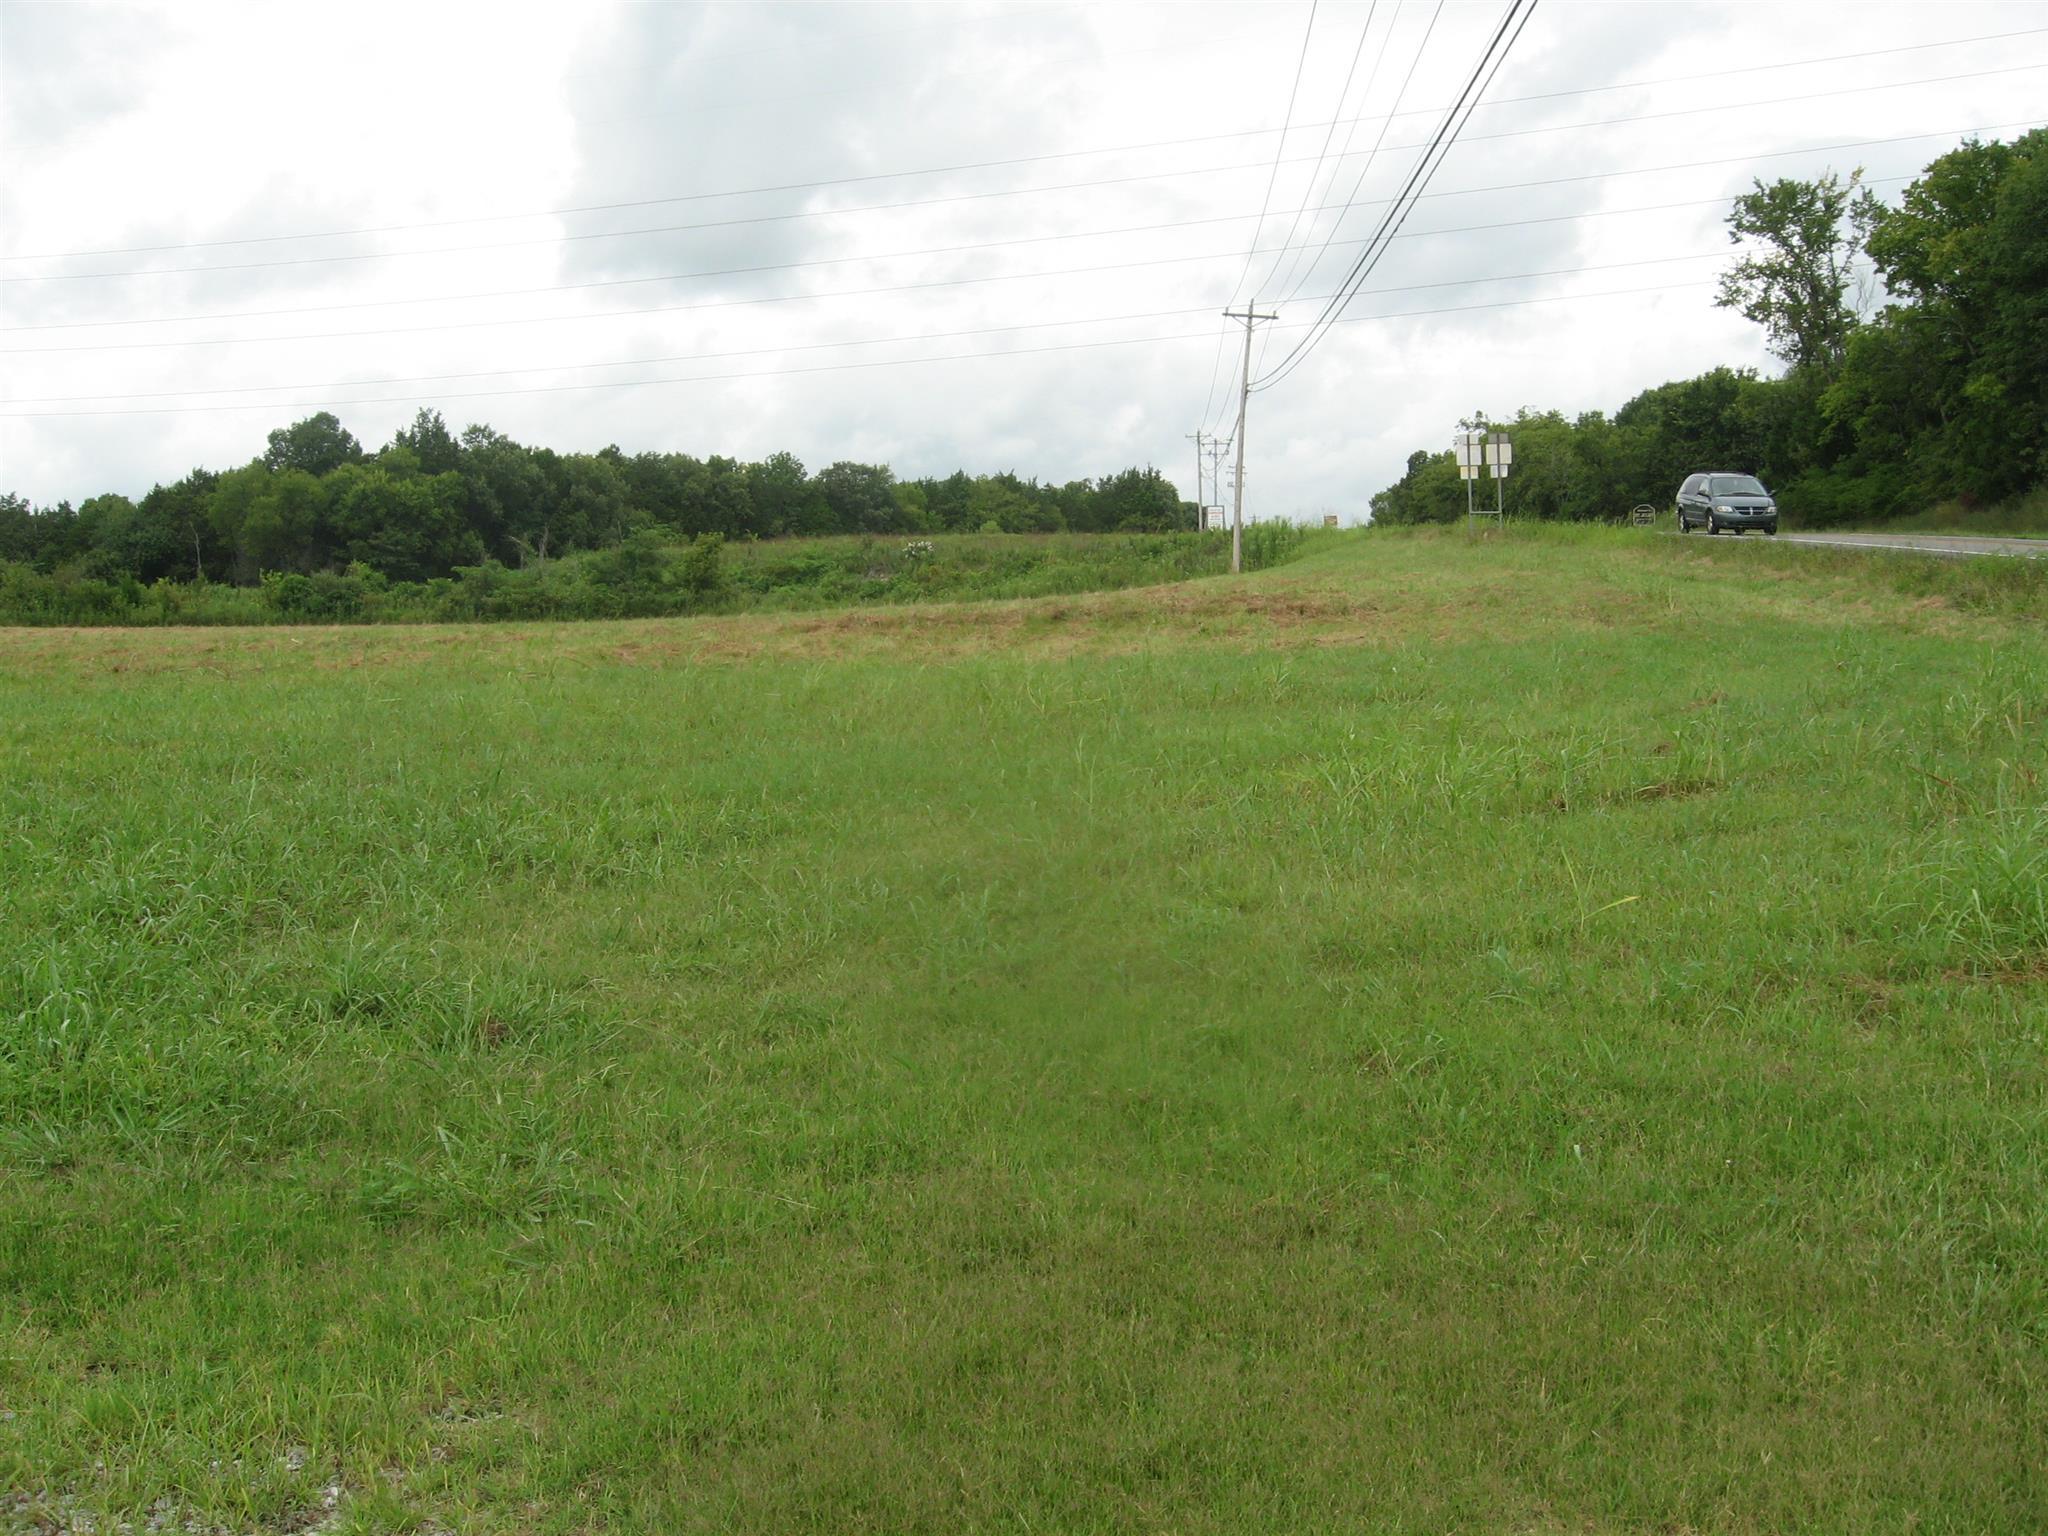 1150 S Mt Juliet Road, Mount Juliet, TN 37122